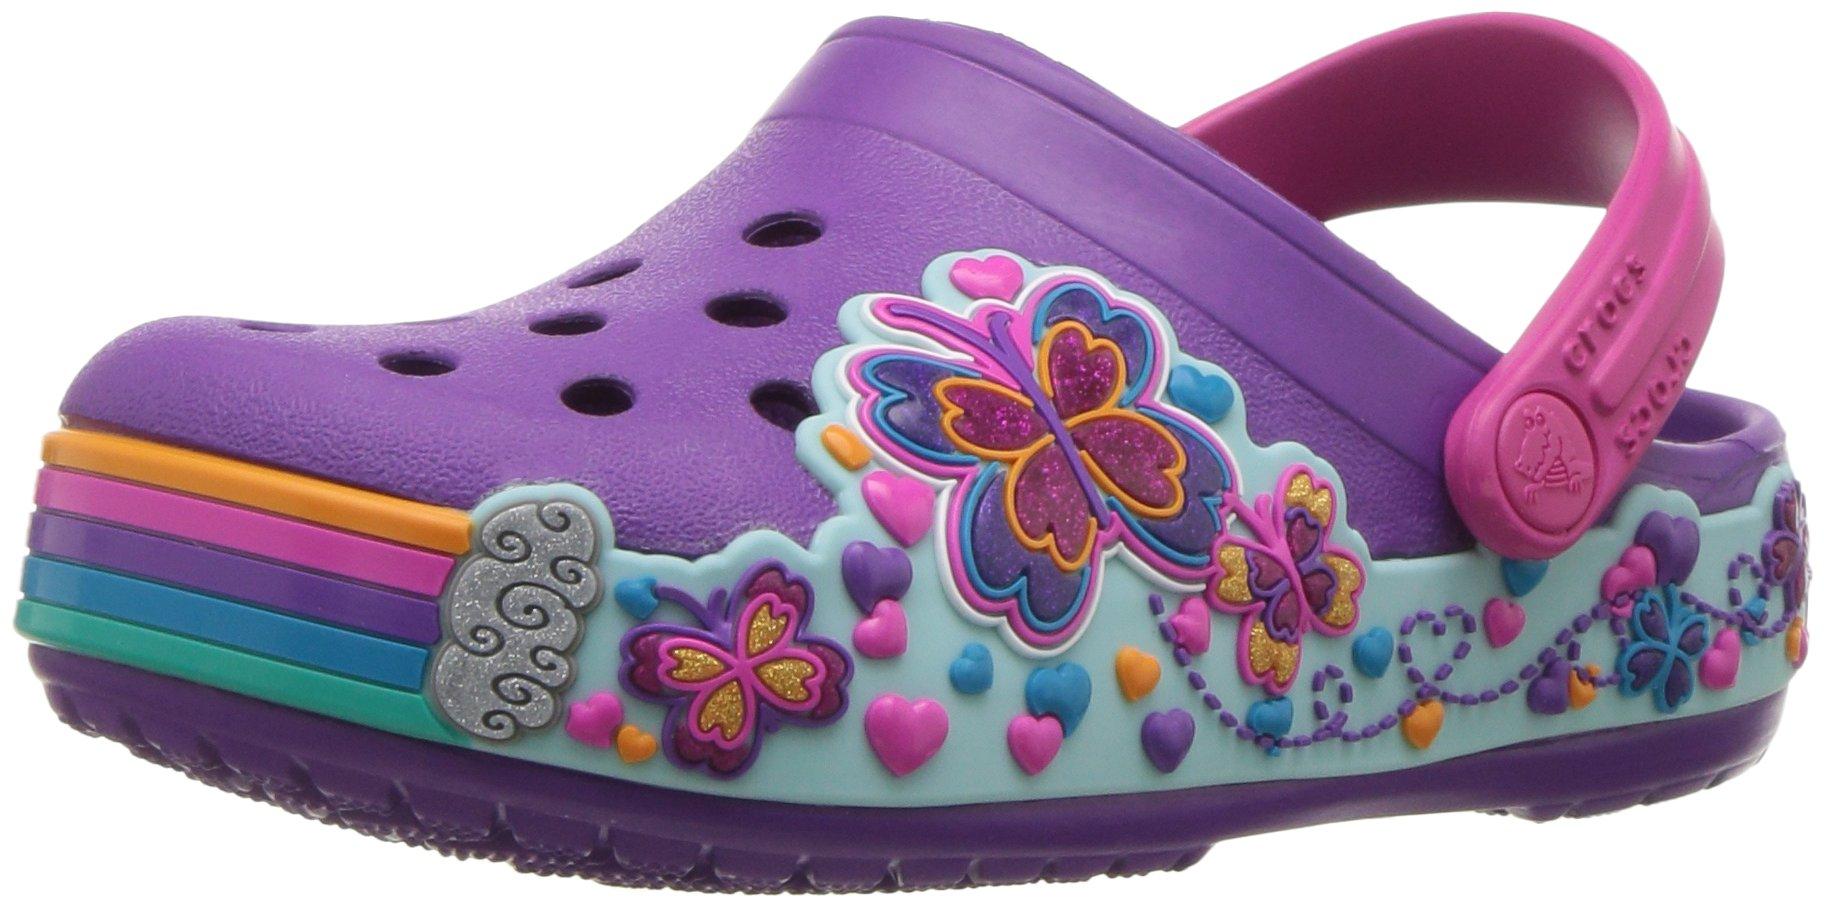 Crocs Unisex-Kids CB Fun Lab Graphic Clg K-Butterfly Clog, Amethyst, 10 M US Little Kid by Crocs (Image #1)